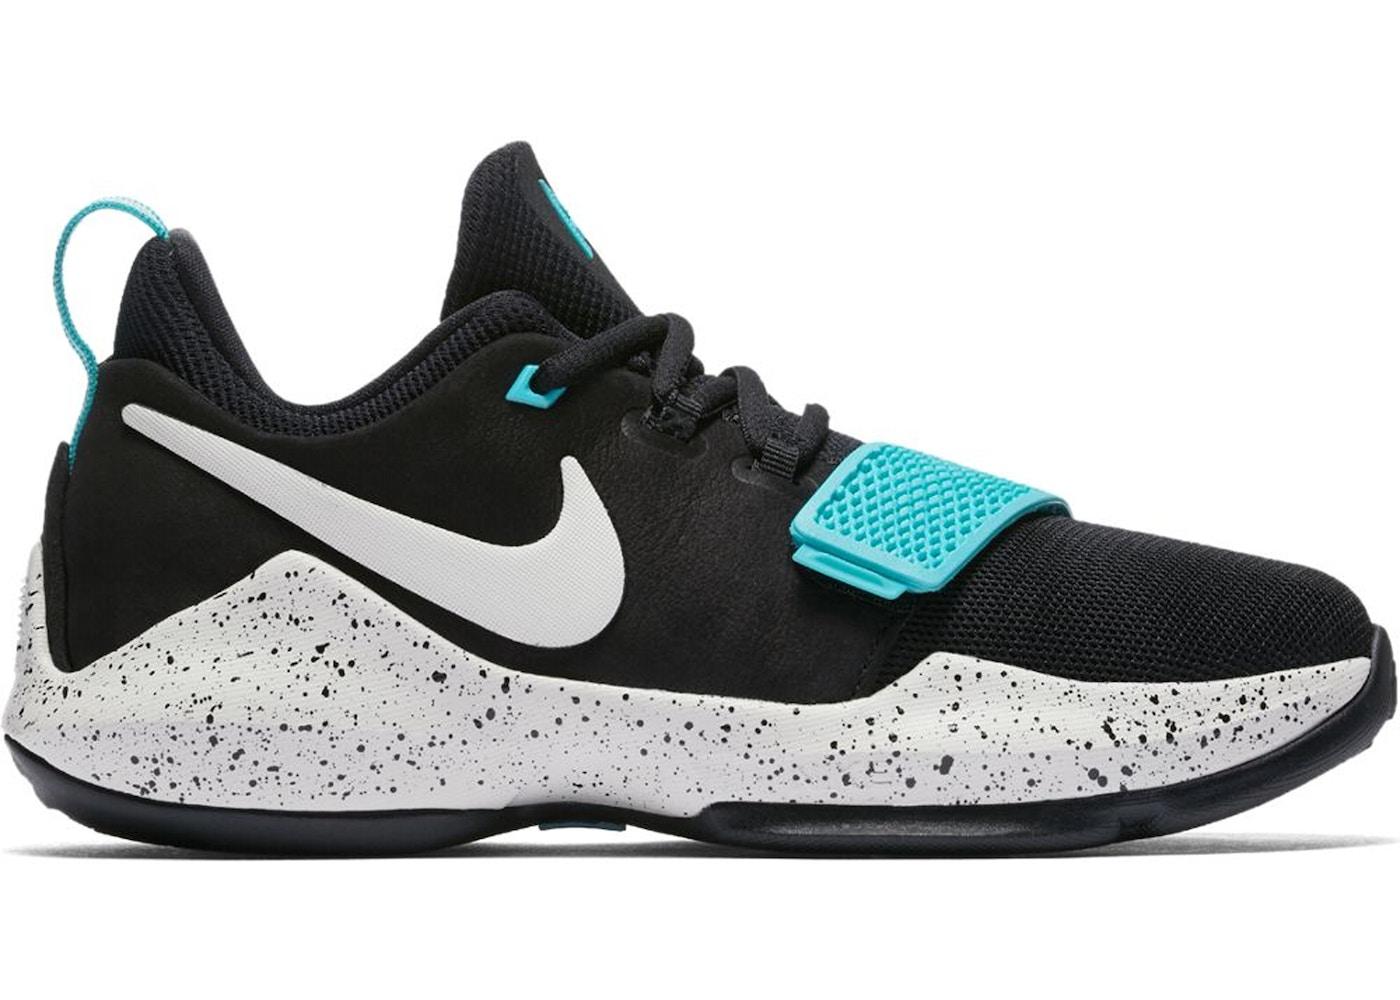 6d5db31df6d Sell. or Ask. Size  6.5Y. View All Bids. Nike PG 1 Black Light Aqua ...